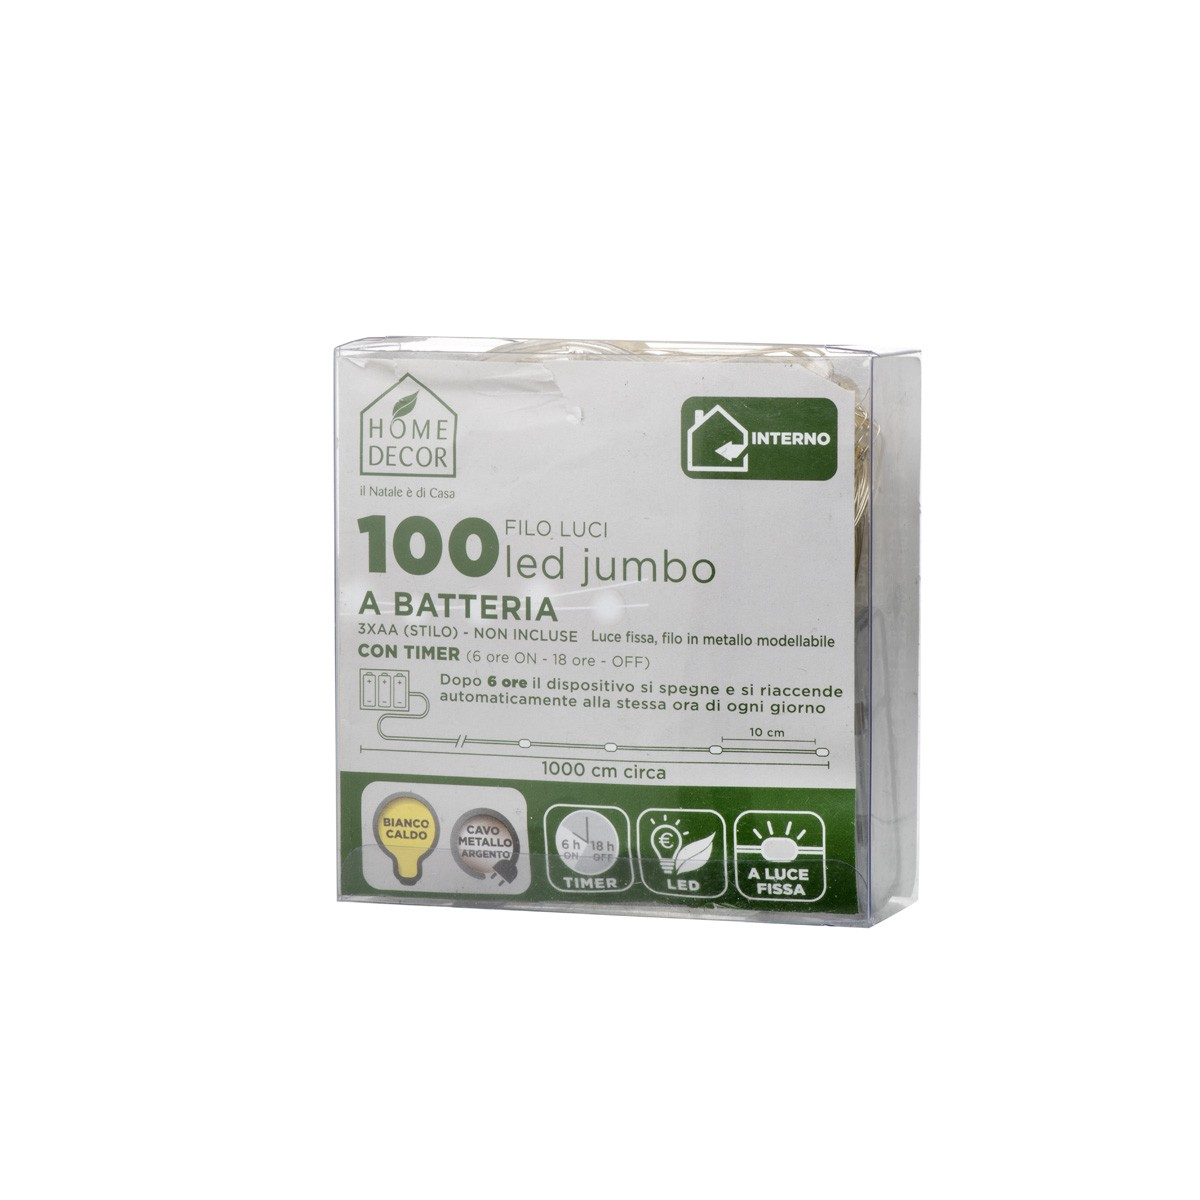 Catena 100 Led Jumbo Bianco Caldo A Batteria